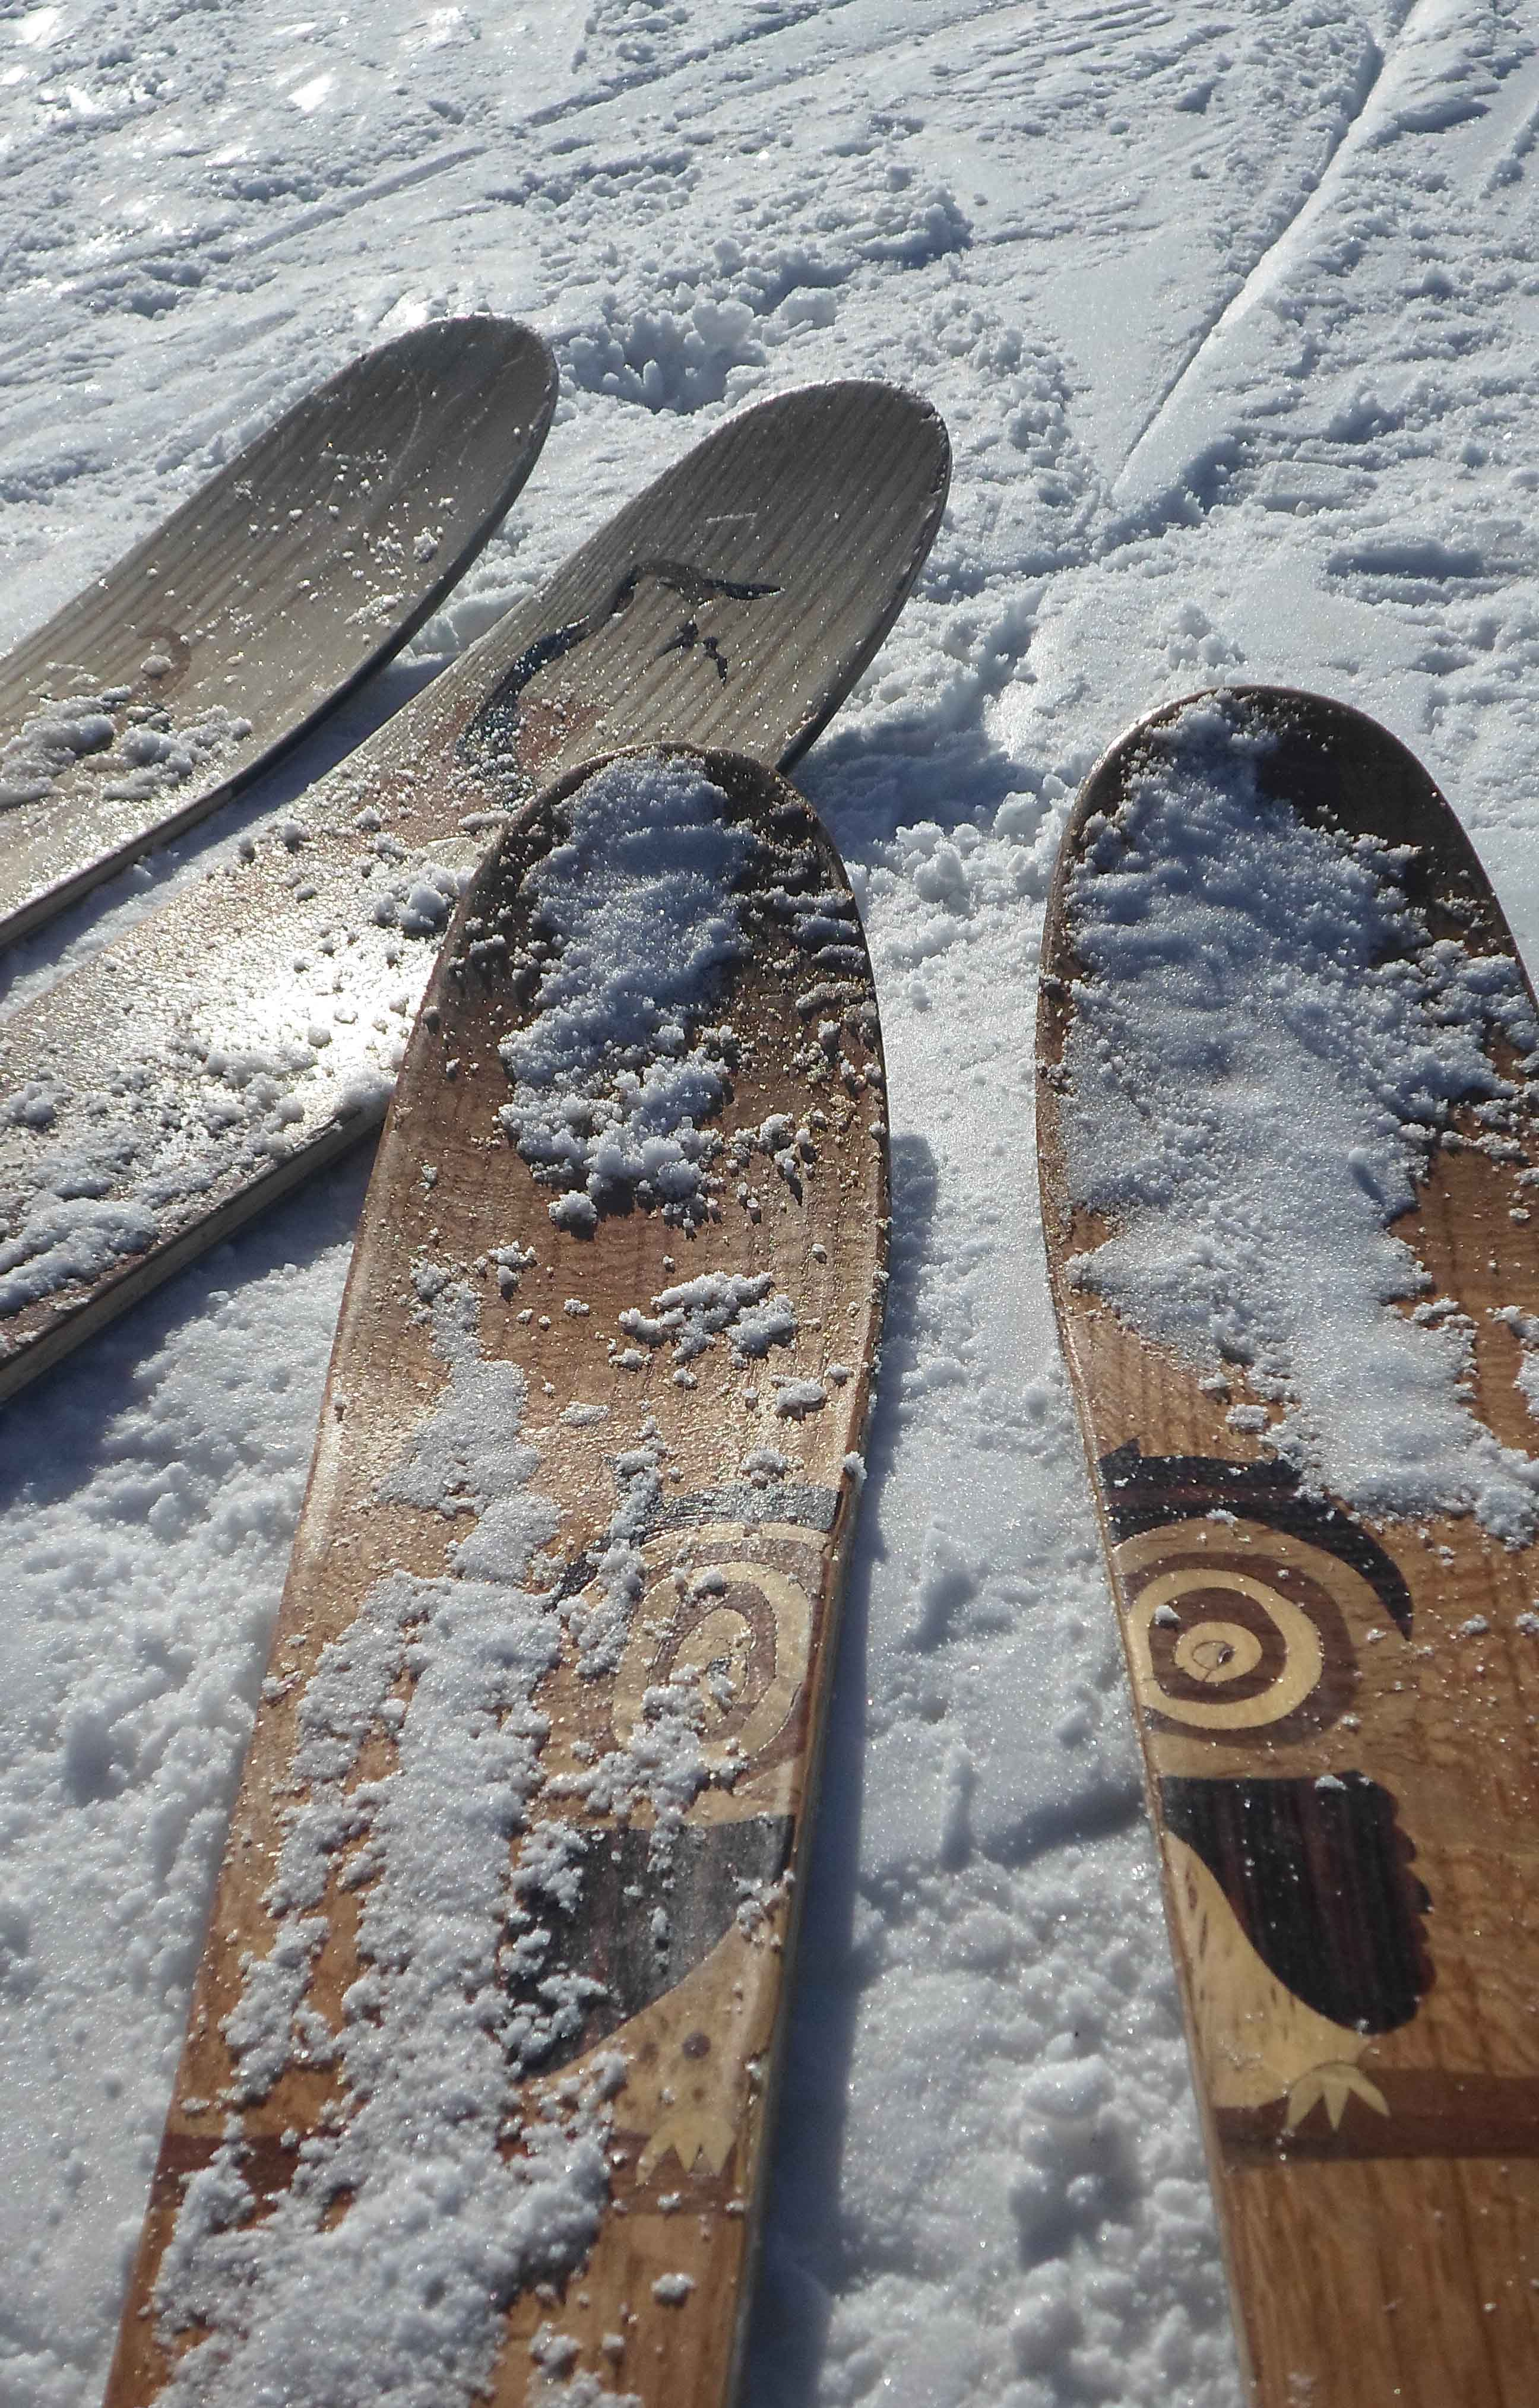 005 Amon Dava ski bois skis sol